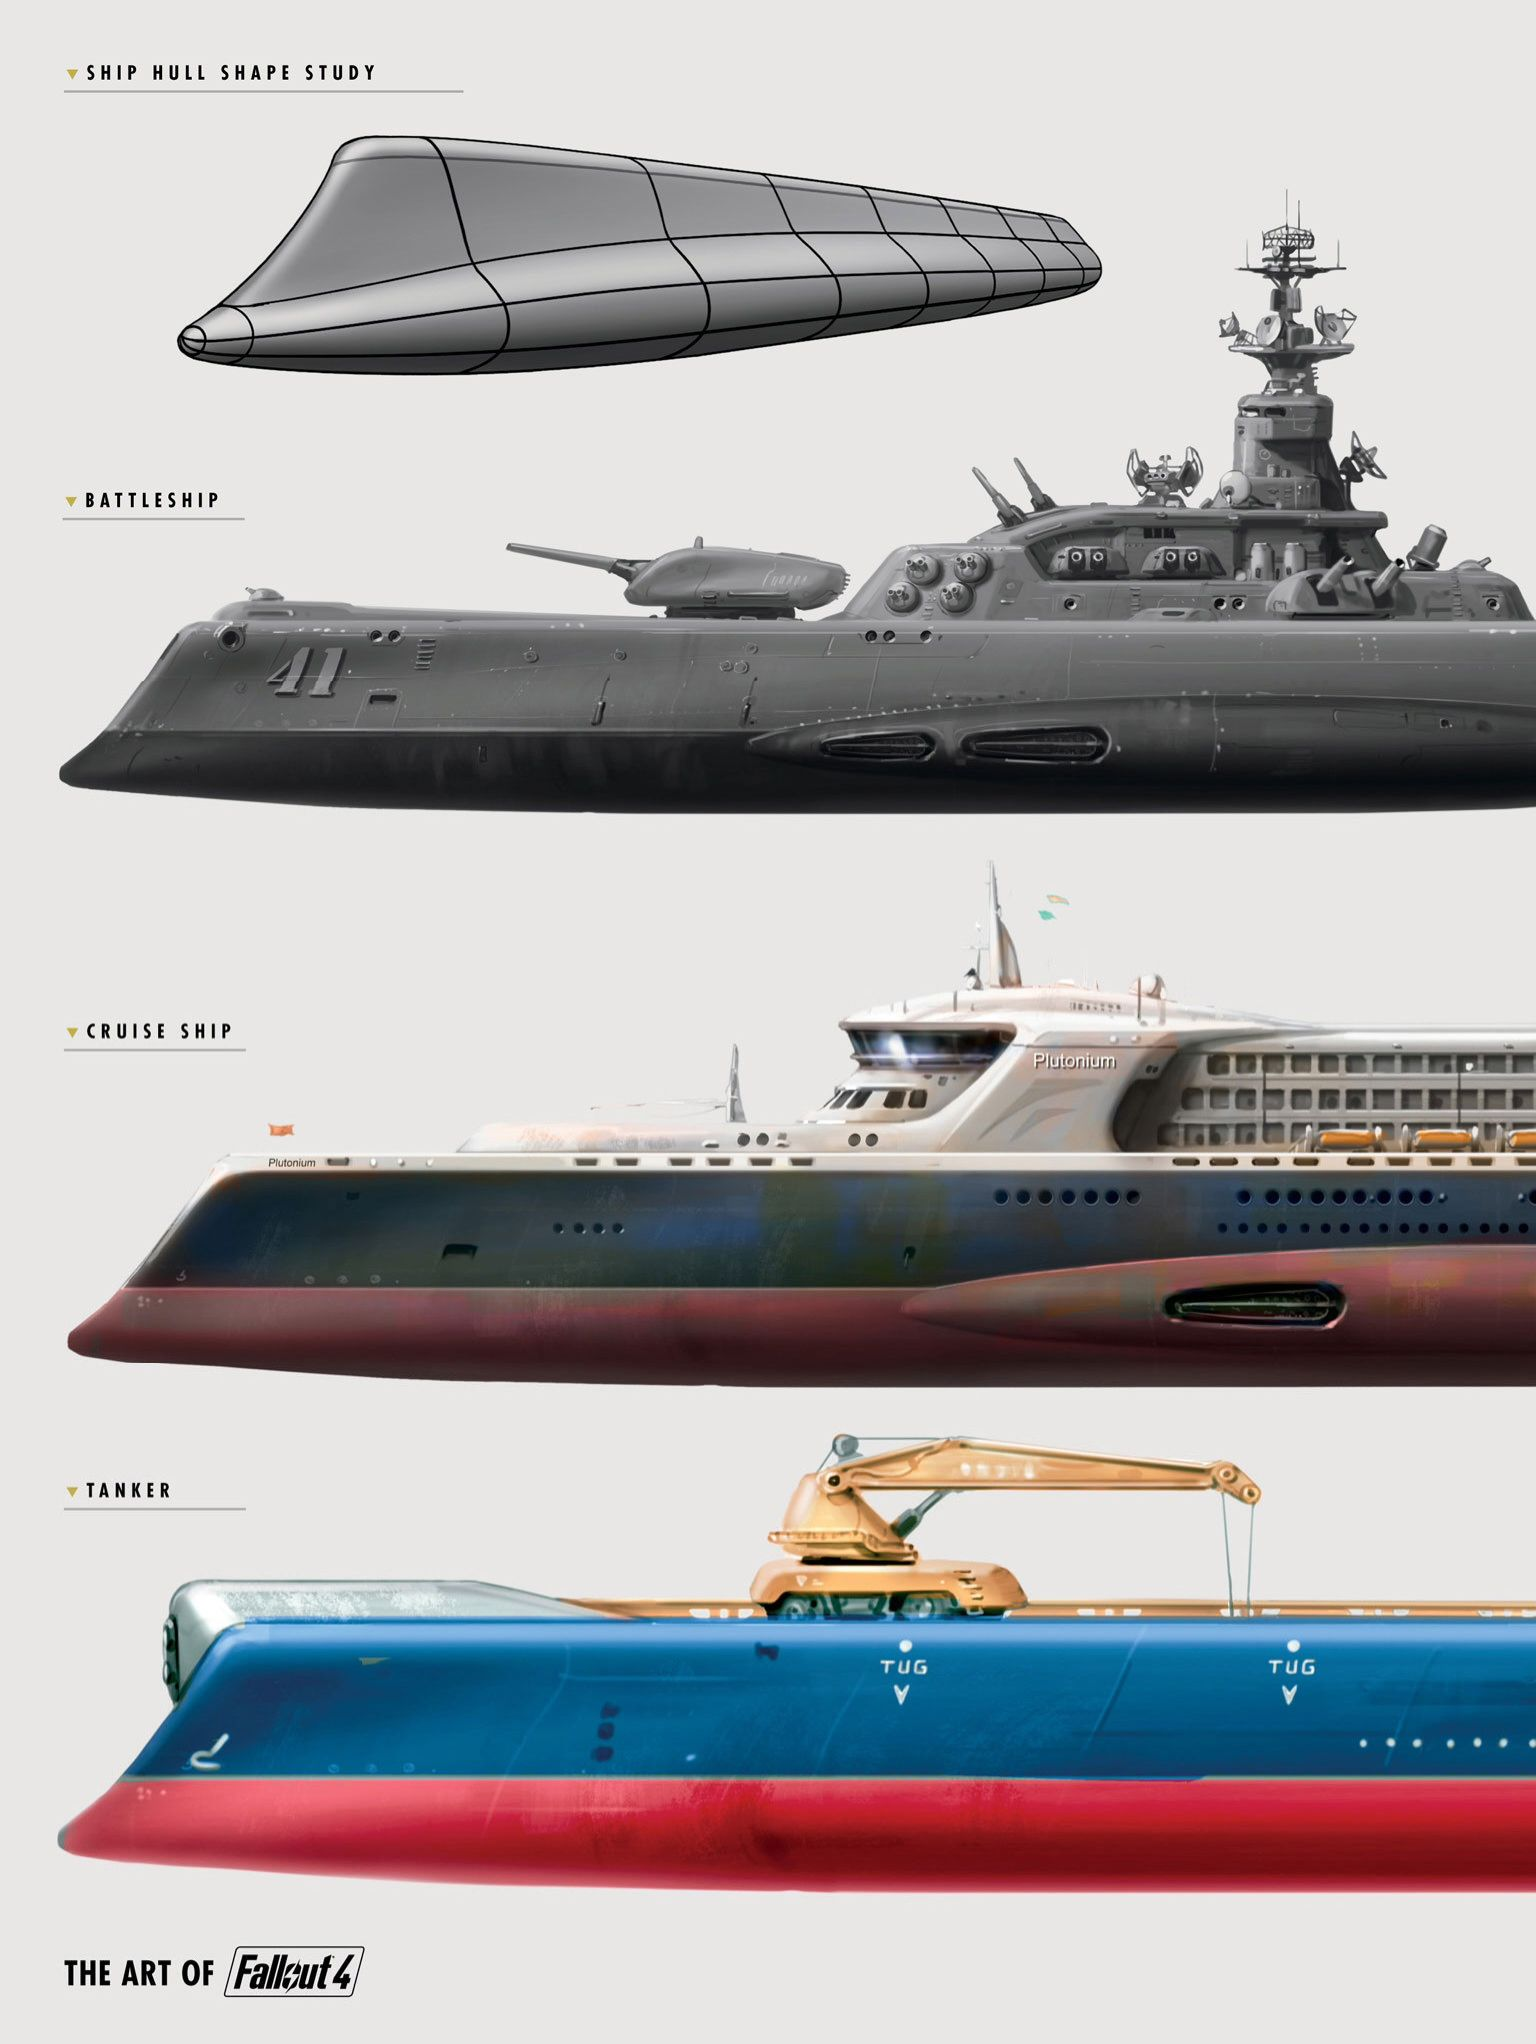 Fallout 4 Concept Ship Hull Shape Study, Battleship